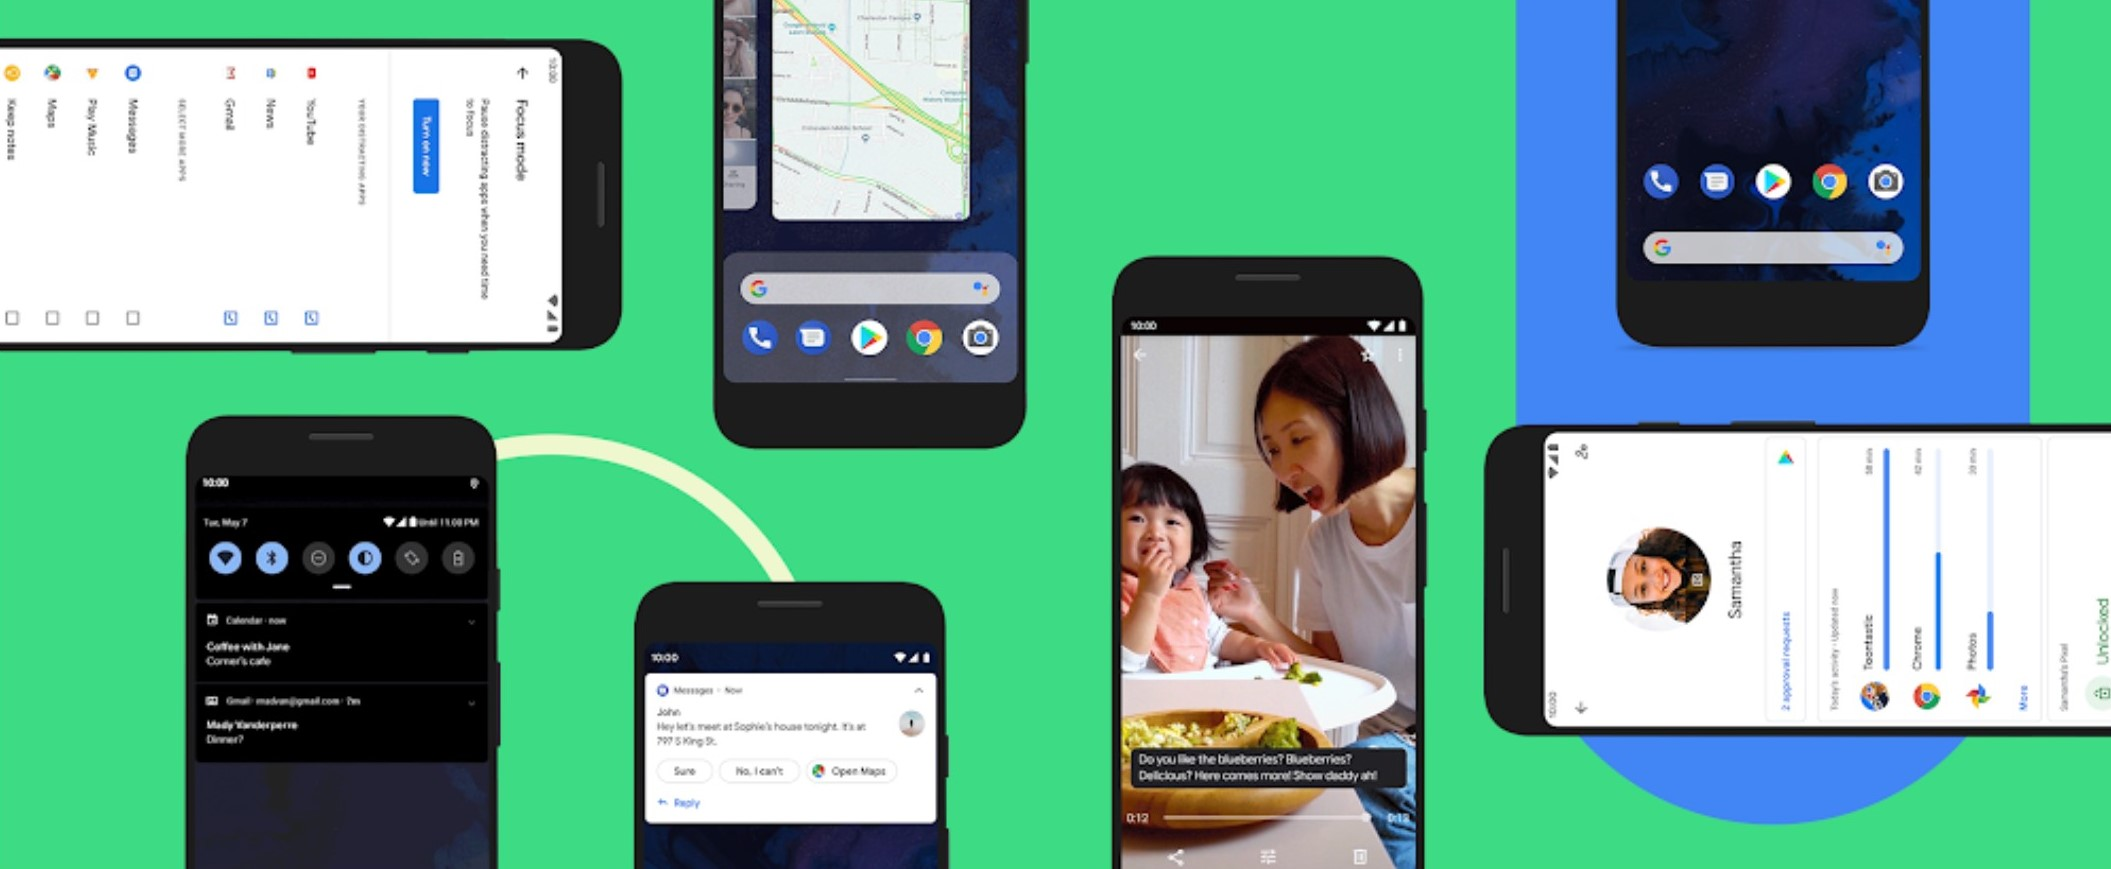 Android 10 dostępny do pobrania na smartfony Google Pixel, Essential Phone i Redmi K20 Pro